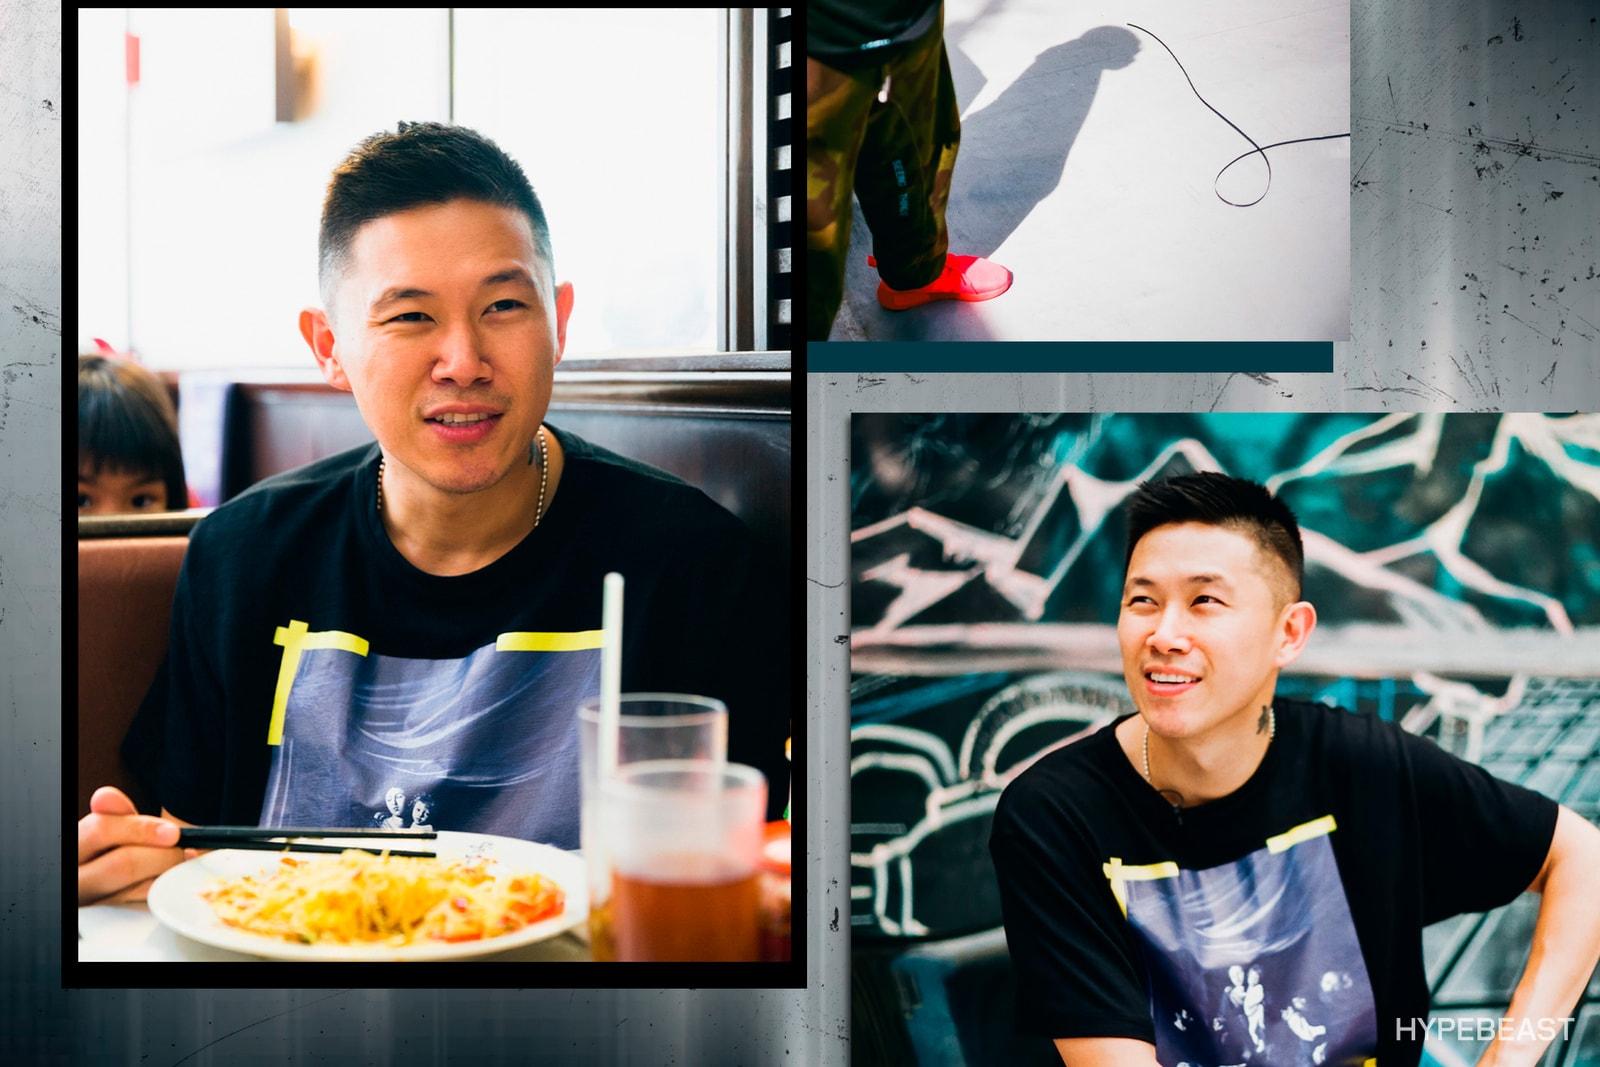 HYPEBEAST 專訪歐陽靖 MC Jin:細說關於《中國有嘻哈》的二三事